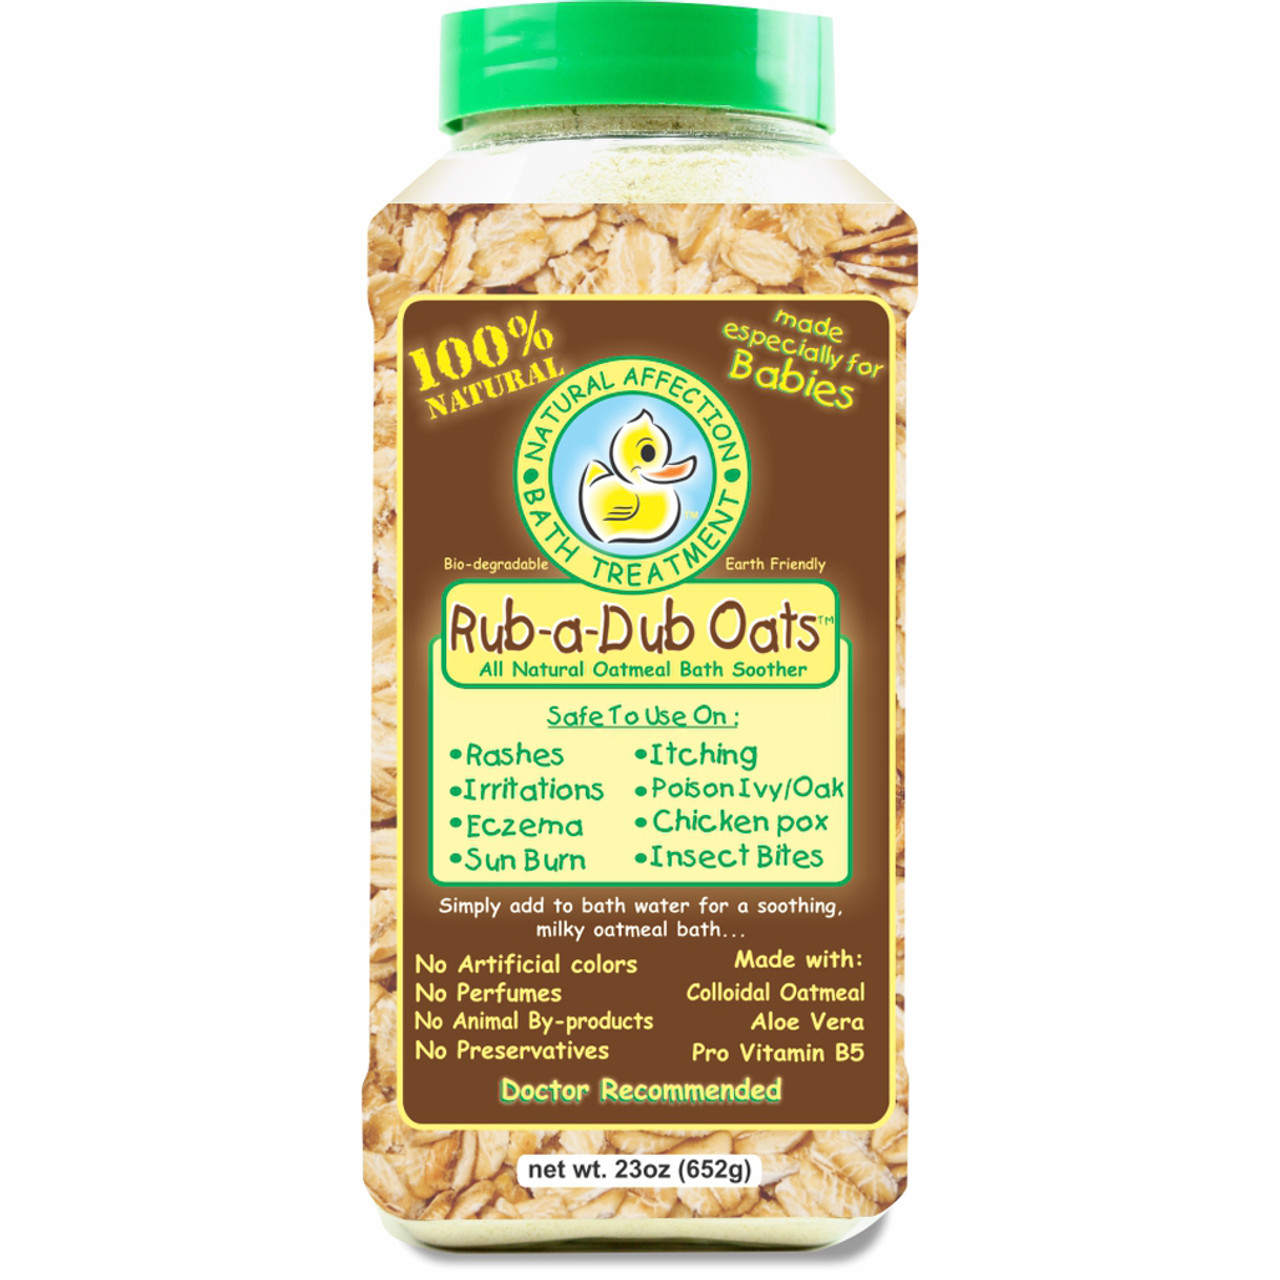 Rub A Dub Oats 23 oz. size